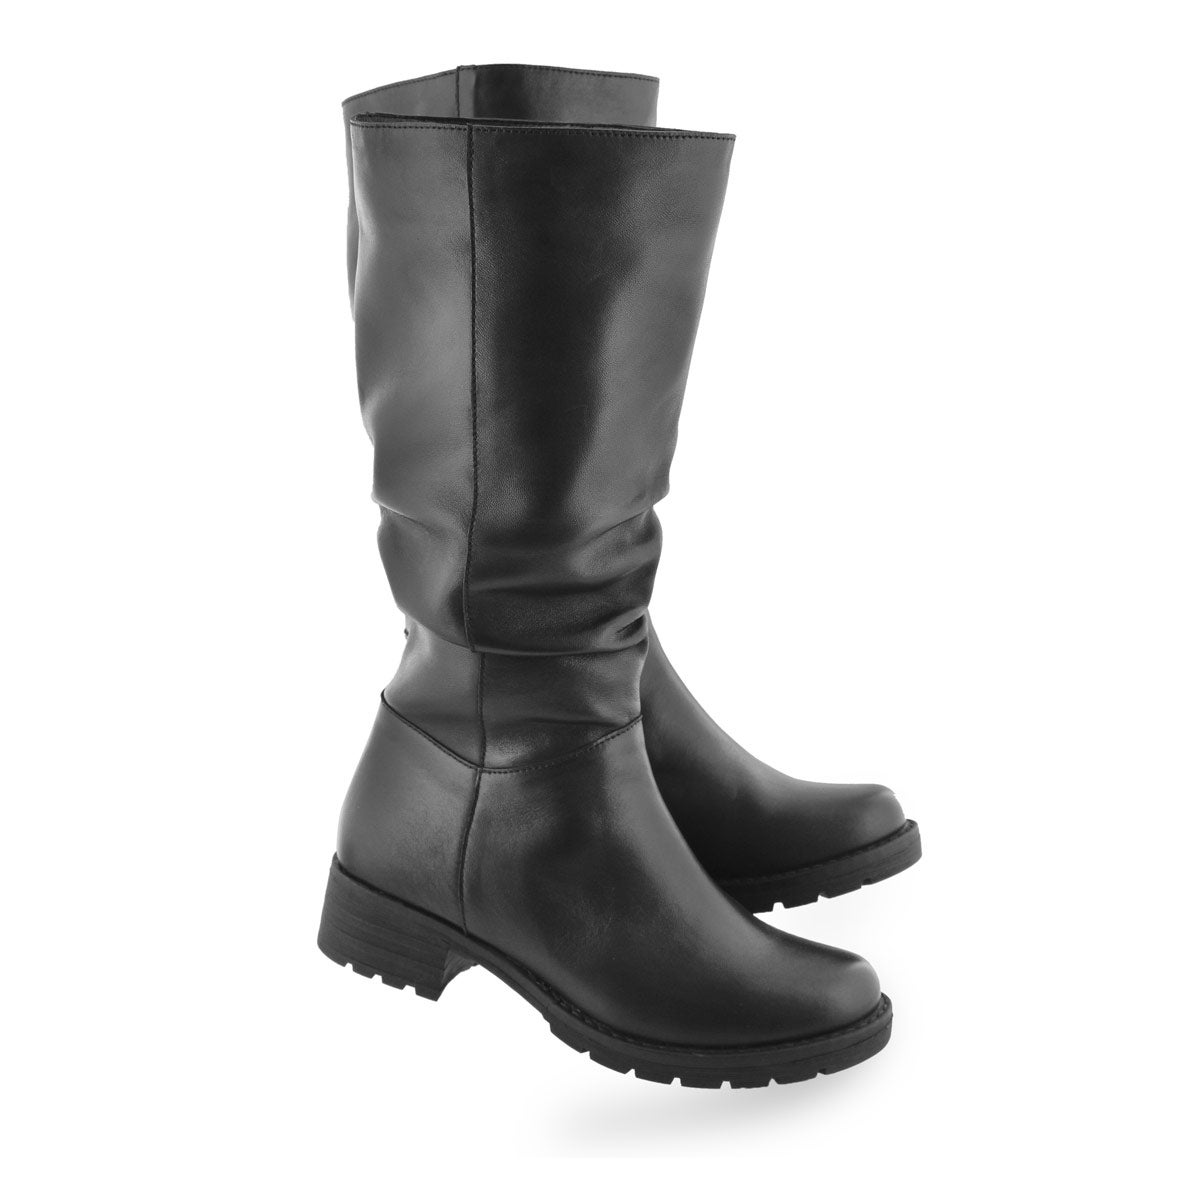 Lds Damaris black casual mid calf boot